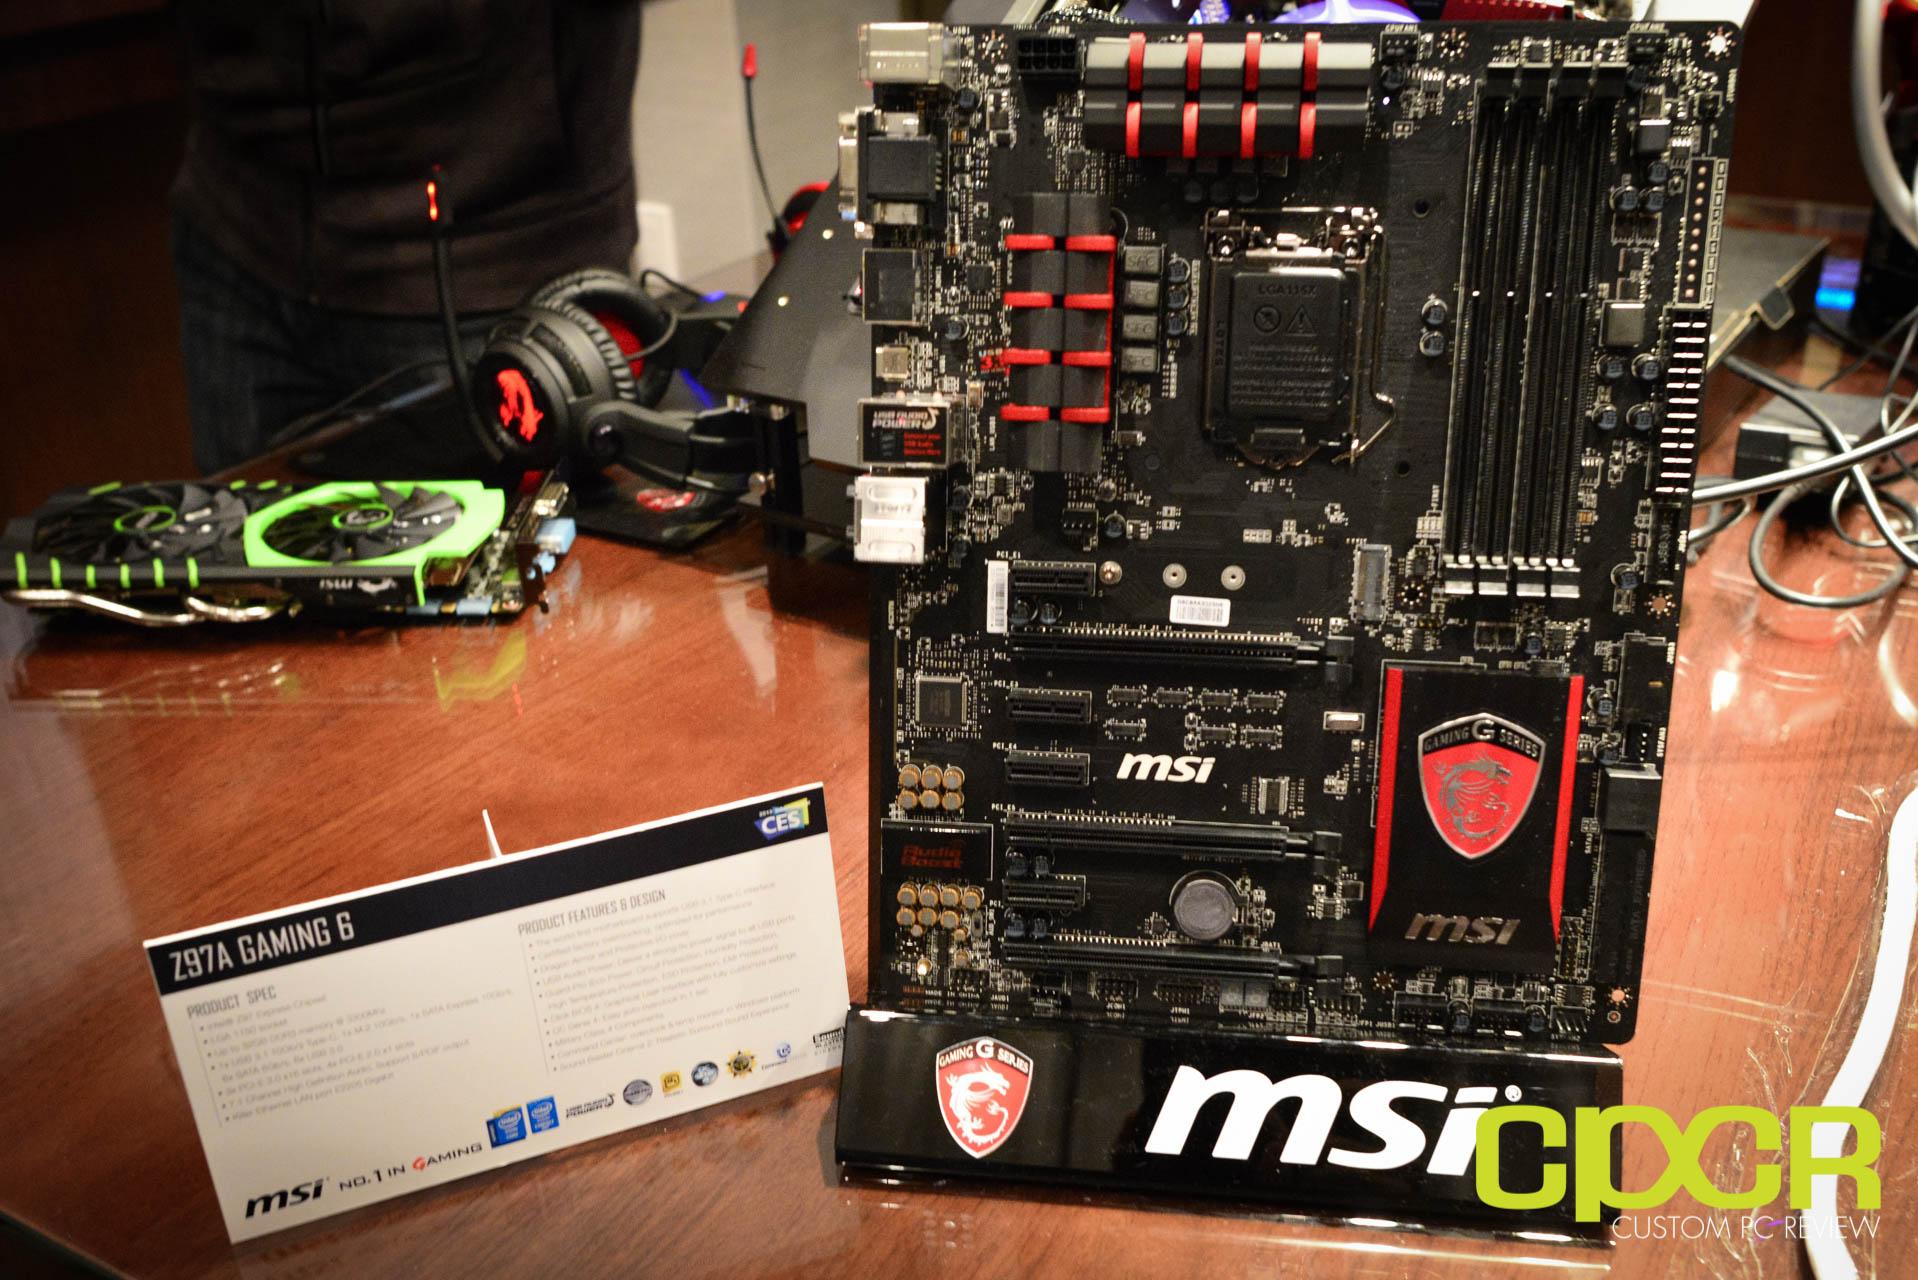 MSI X99A Gaming 9 ACK VIA USB 3.0 64 BIT Driver